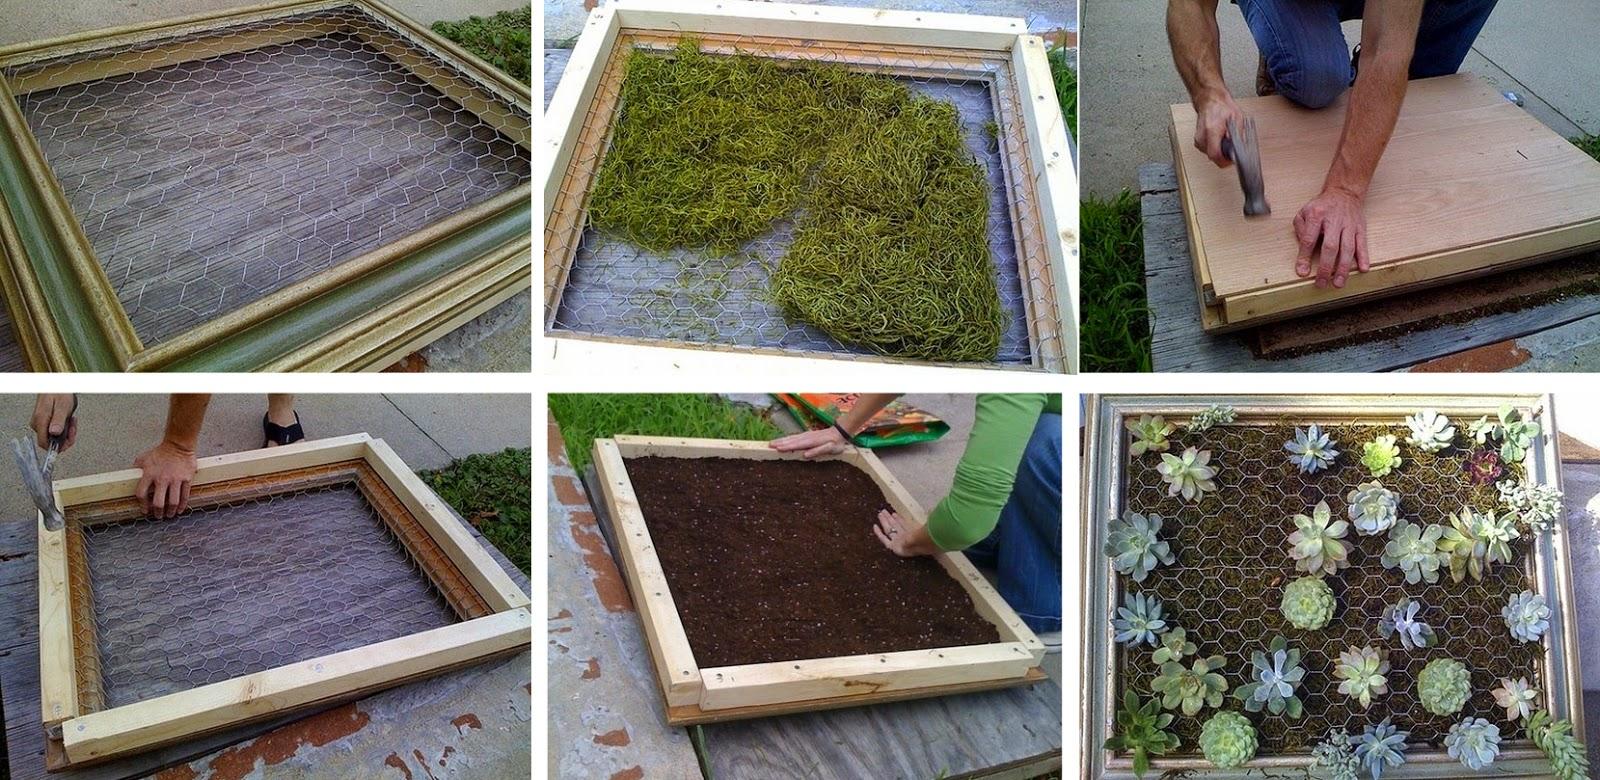 Alexandra proa o 3d green pear diaries diy for Ideas faciles para decorar jardines